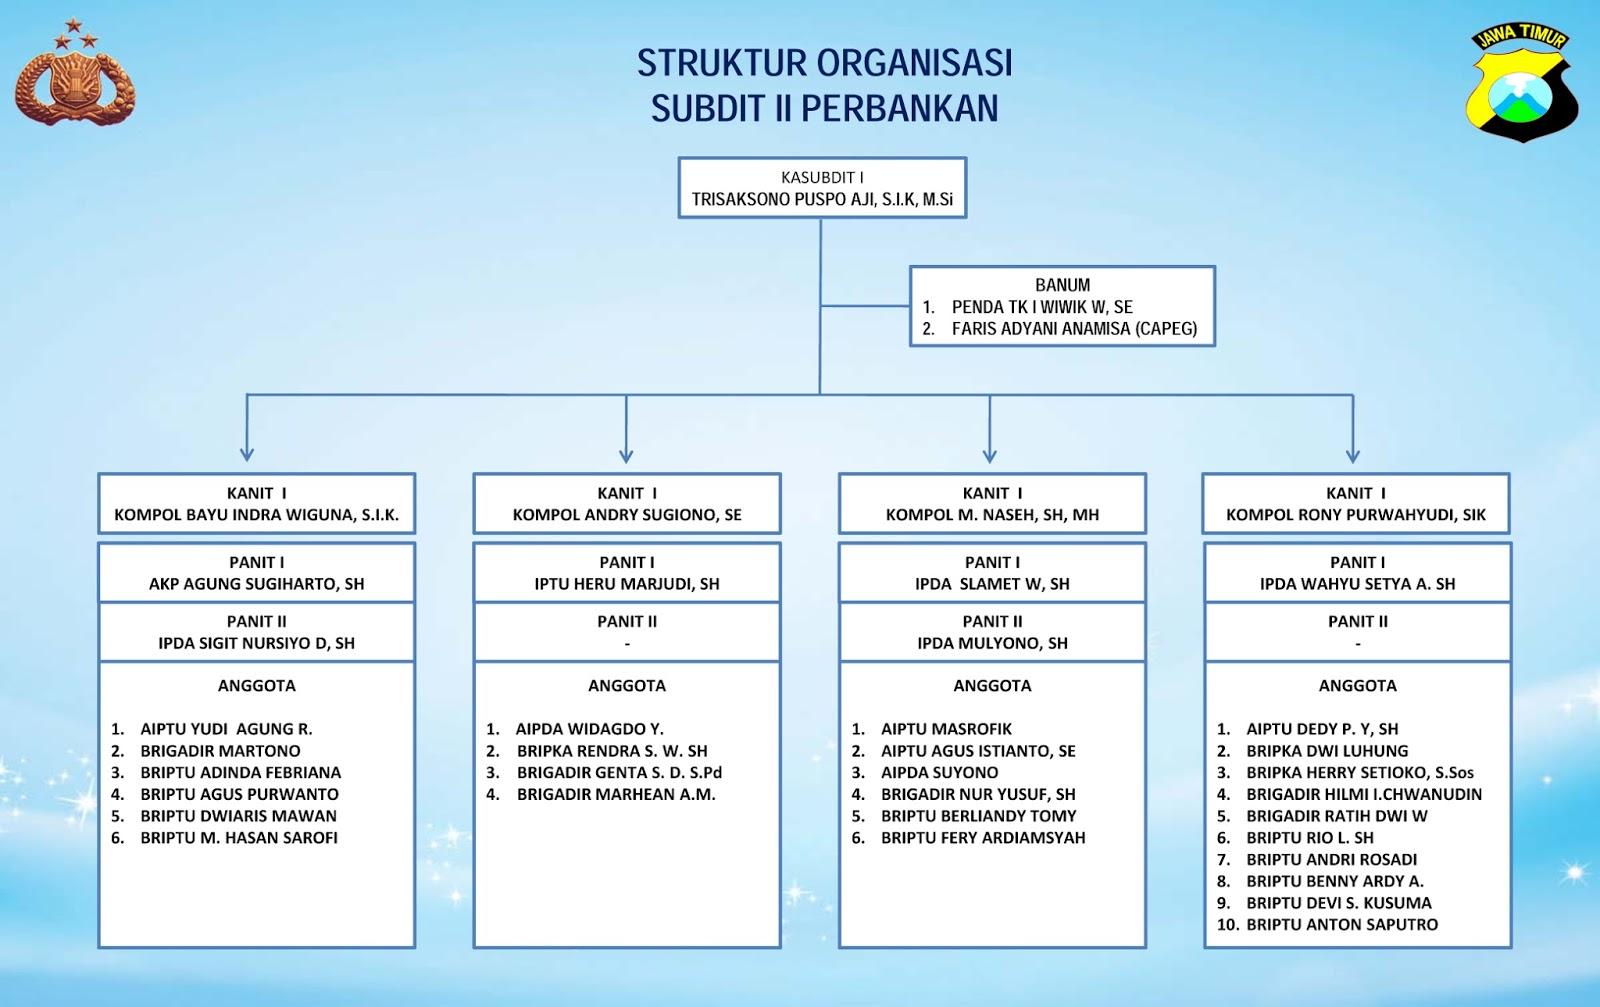 struktur organisasi jatim park \u2013 remembers egregation Struktur Organisasi Pemuda struktur organisasi subdit ii